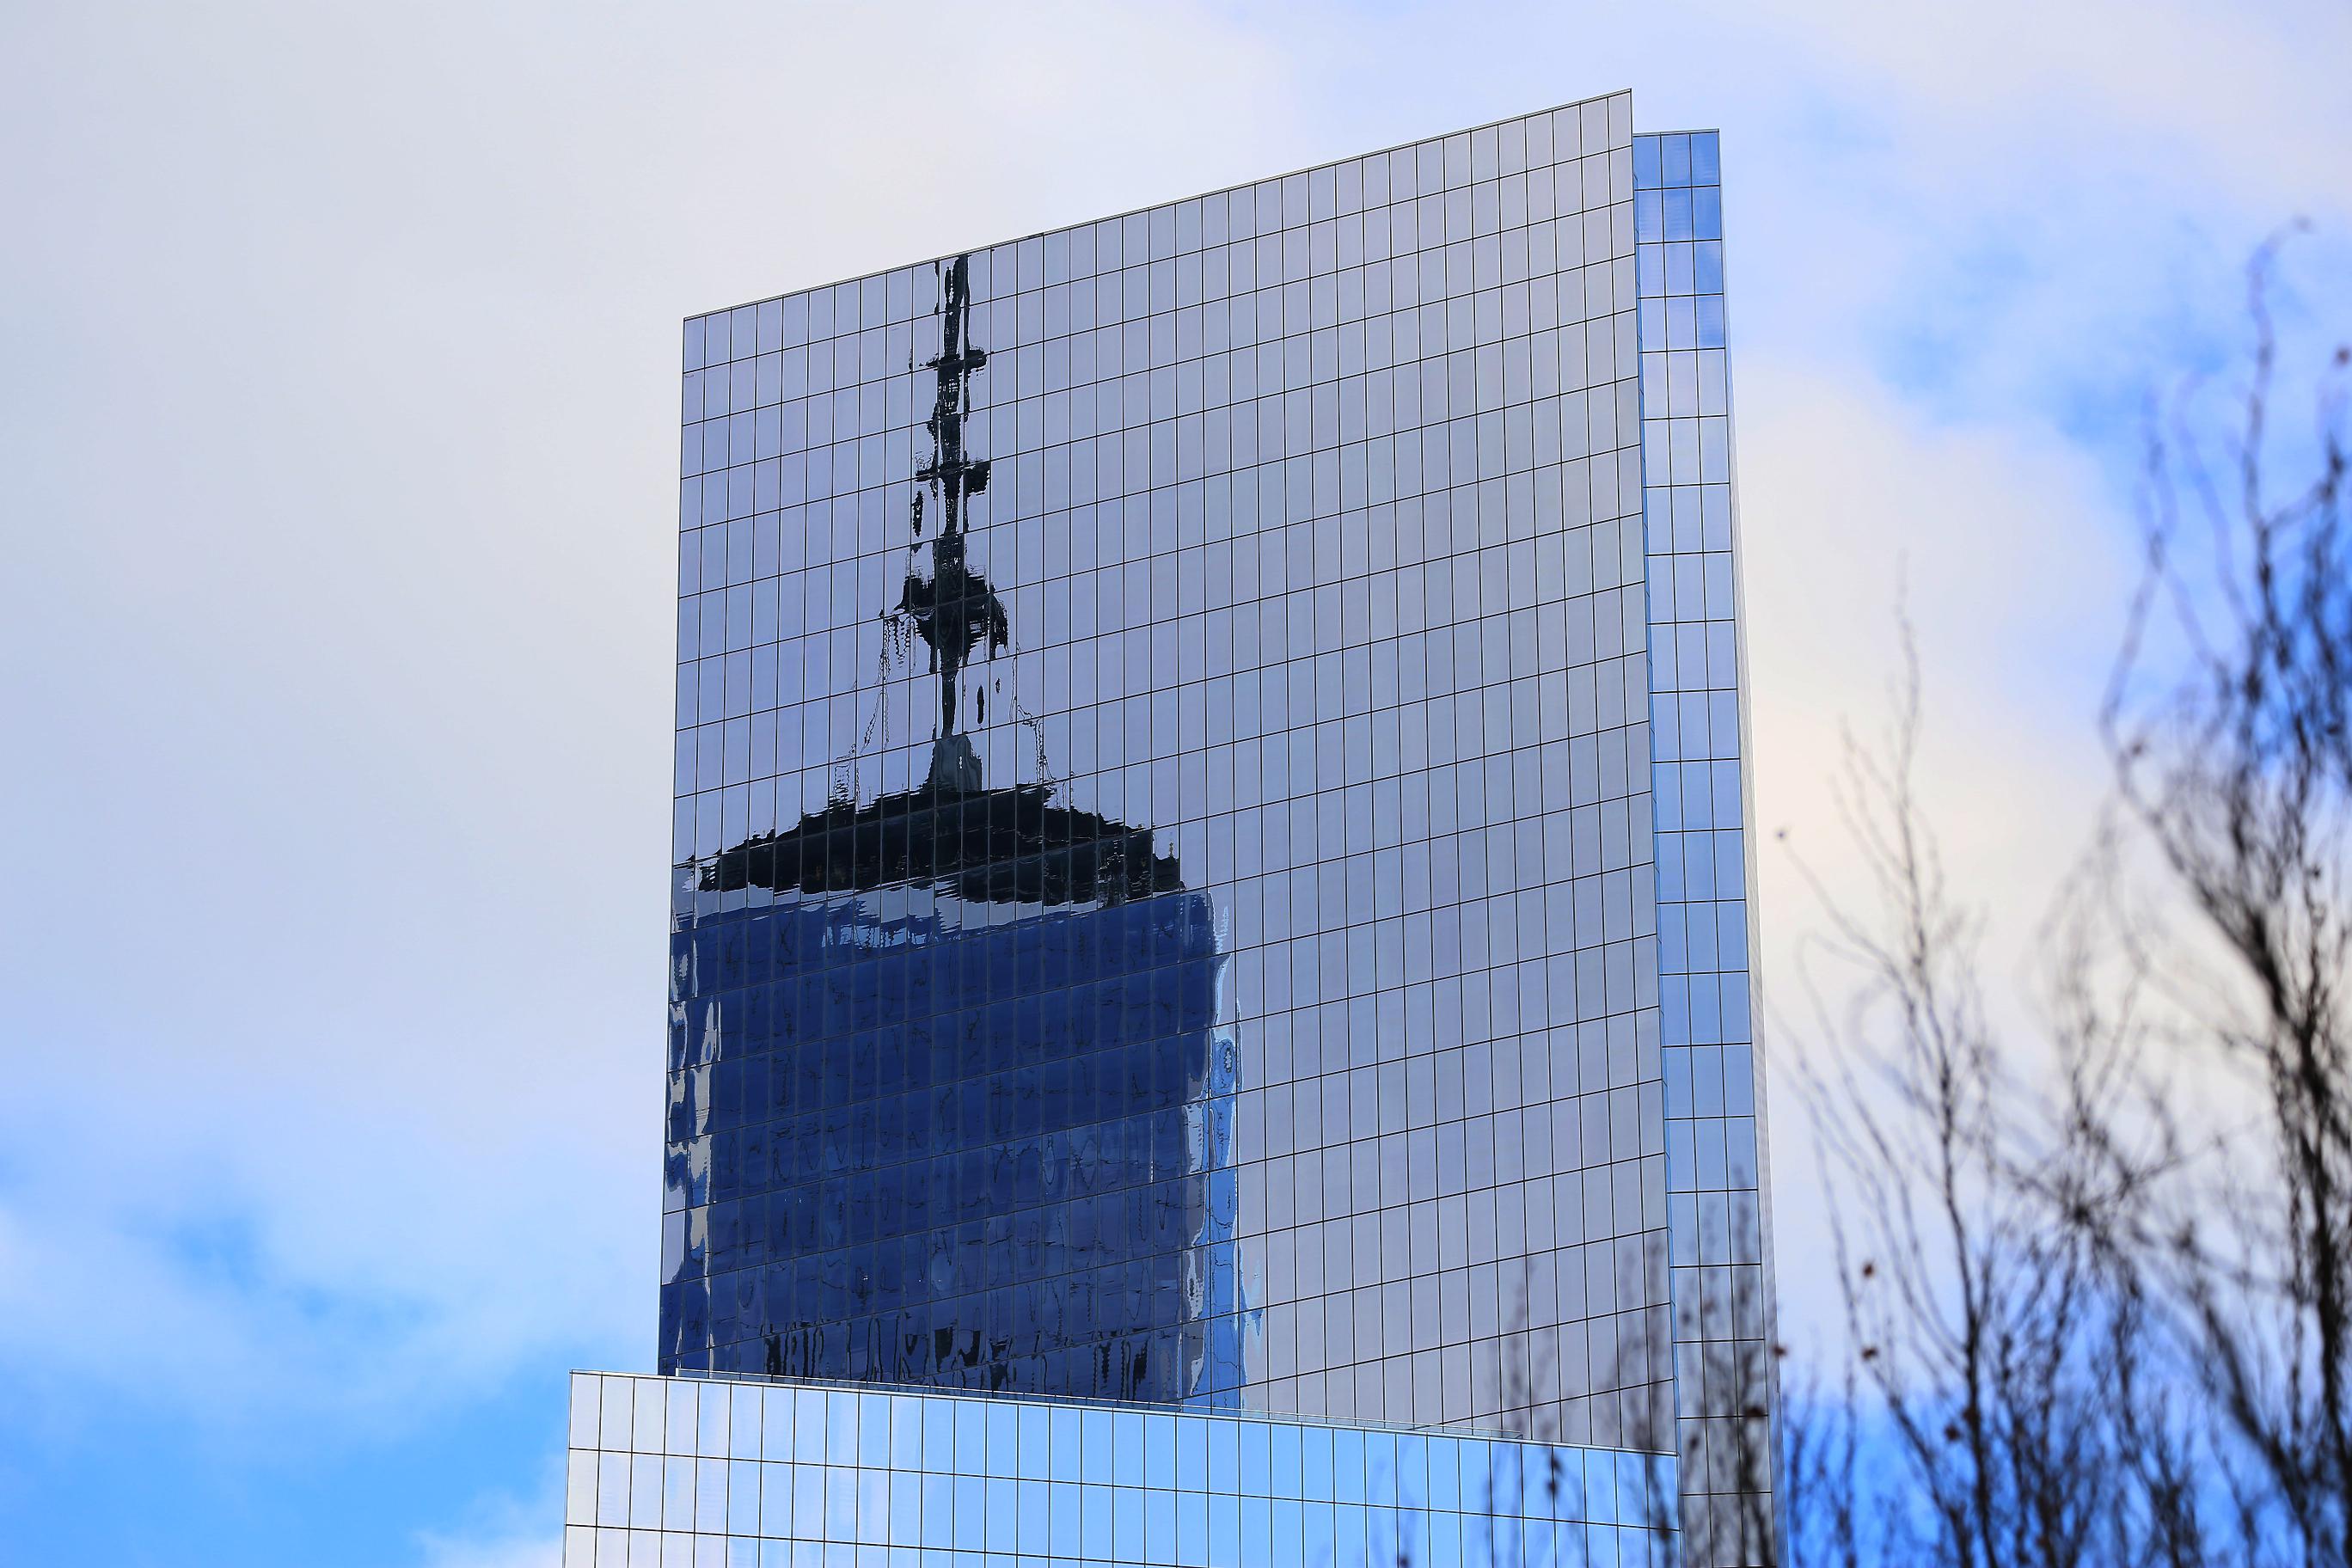 Den nybyggda TWC-skrapan speglar sig i en grannbyggnad.